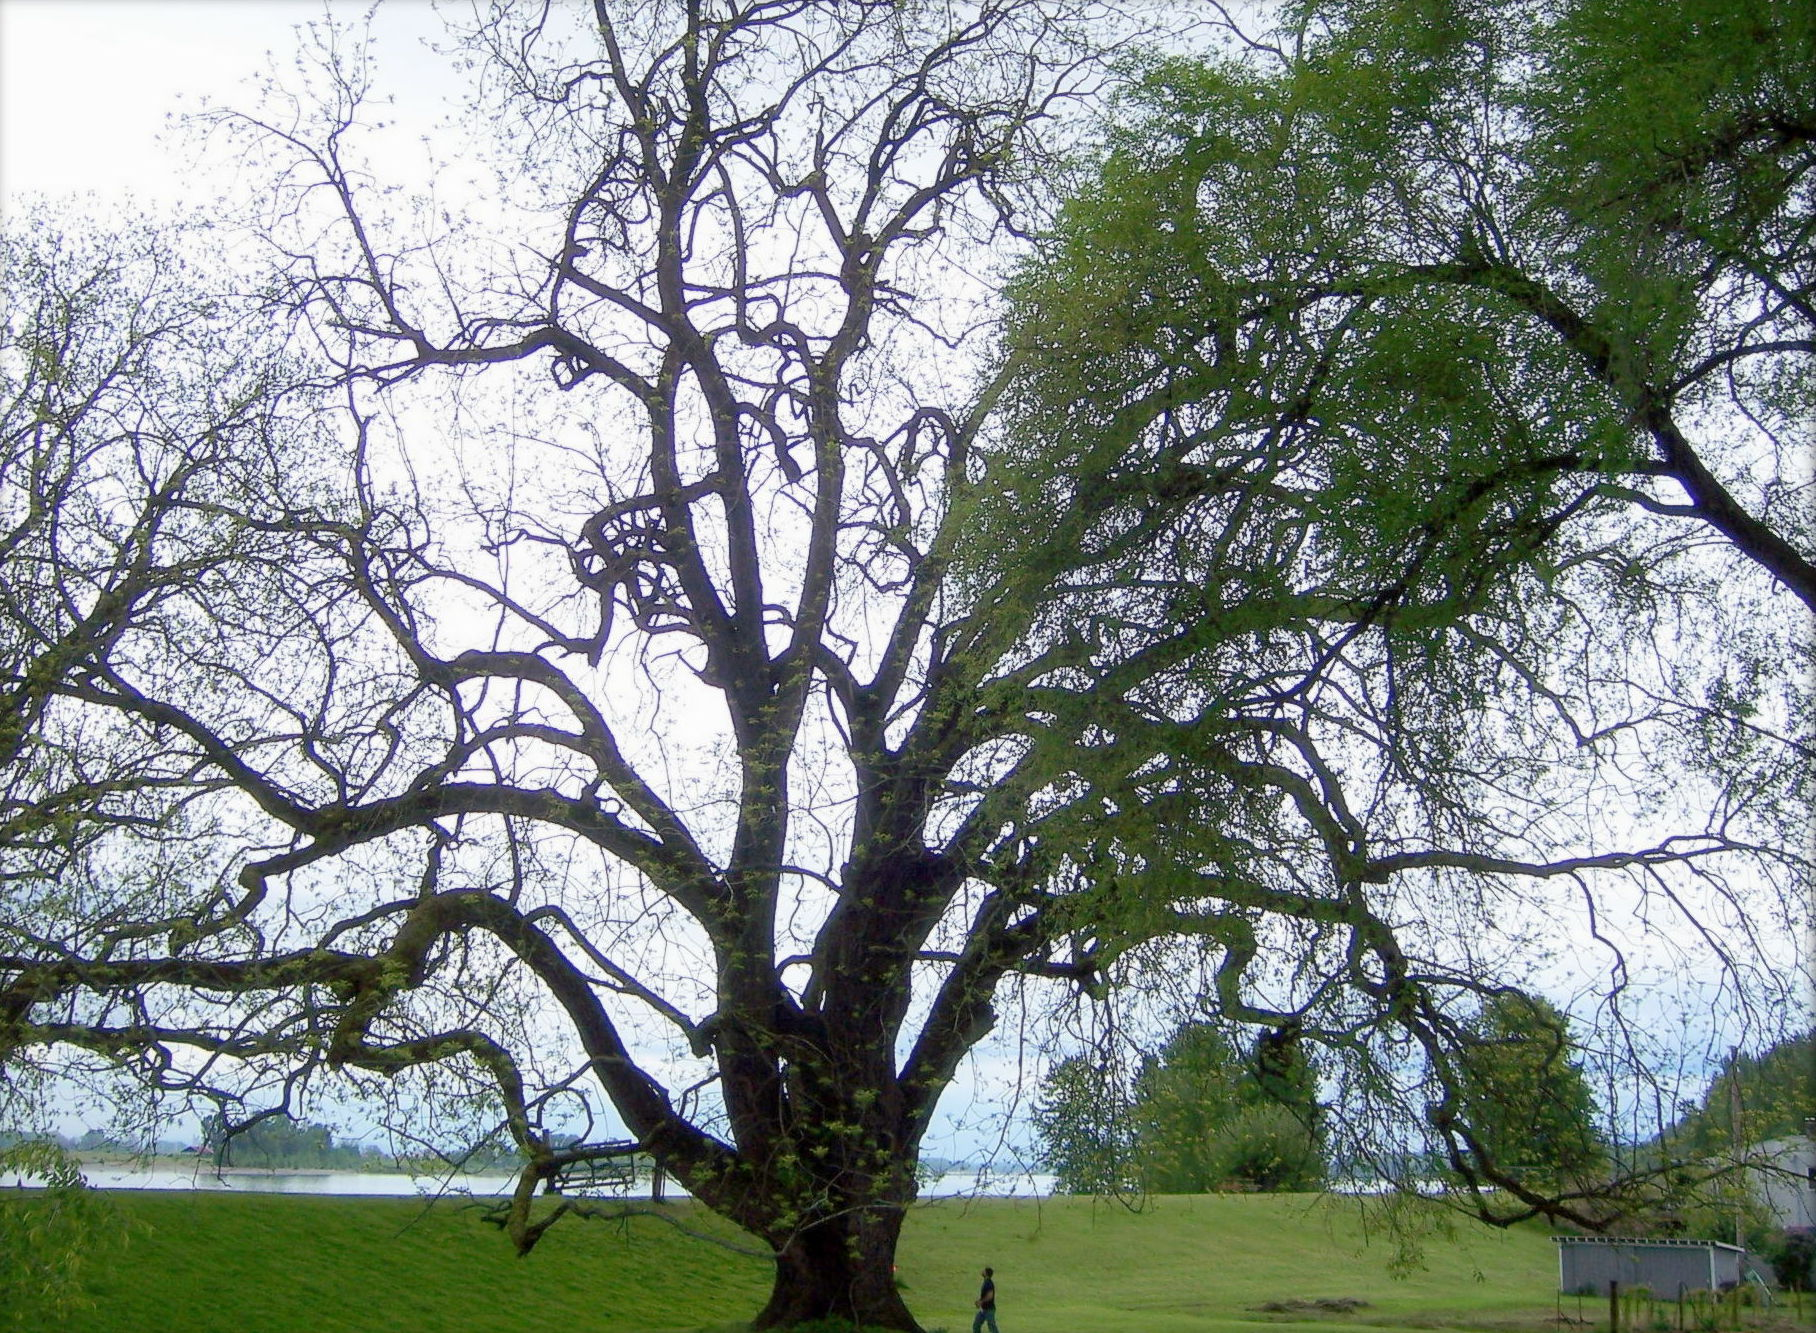 Black Walnut Tree facts garden id toxic | The Old Farmer's Almanac